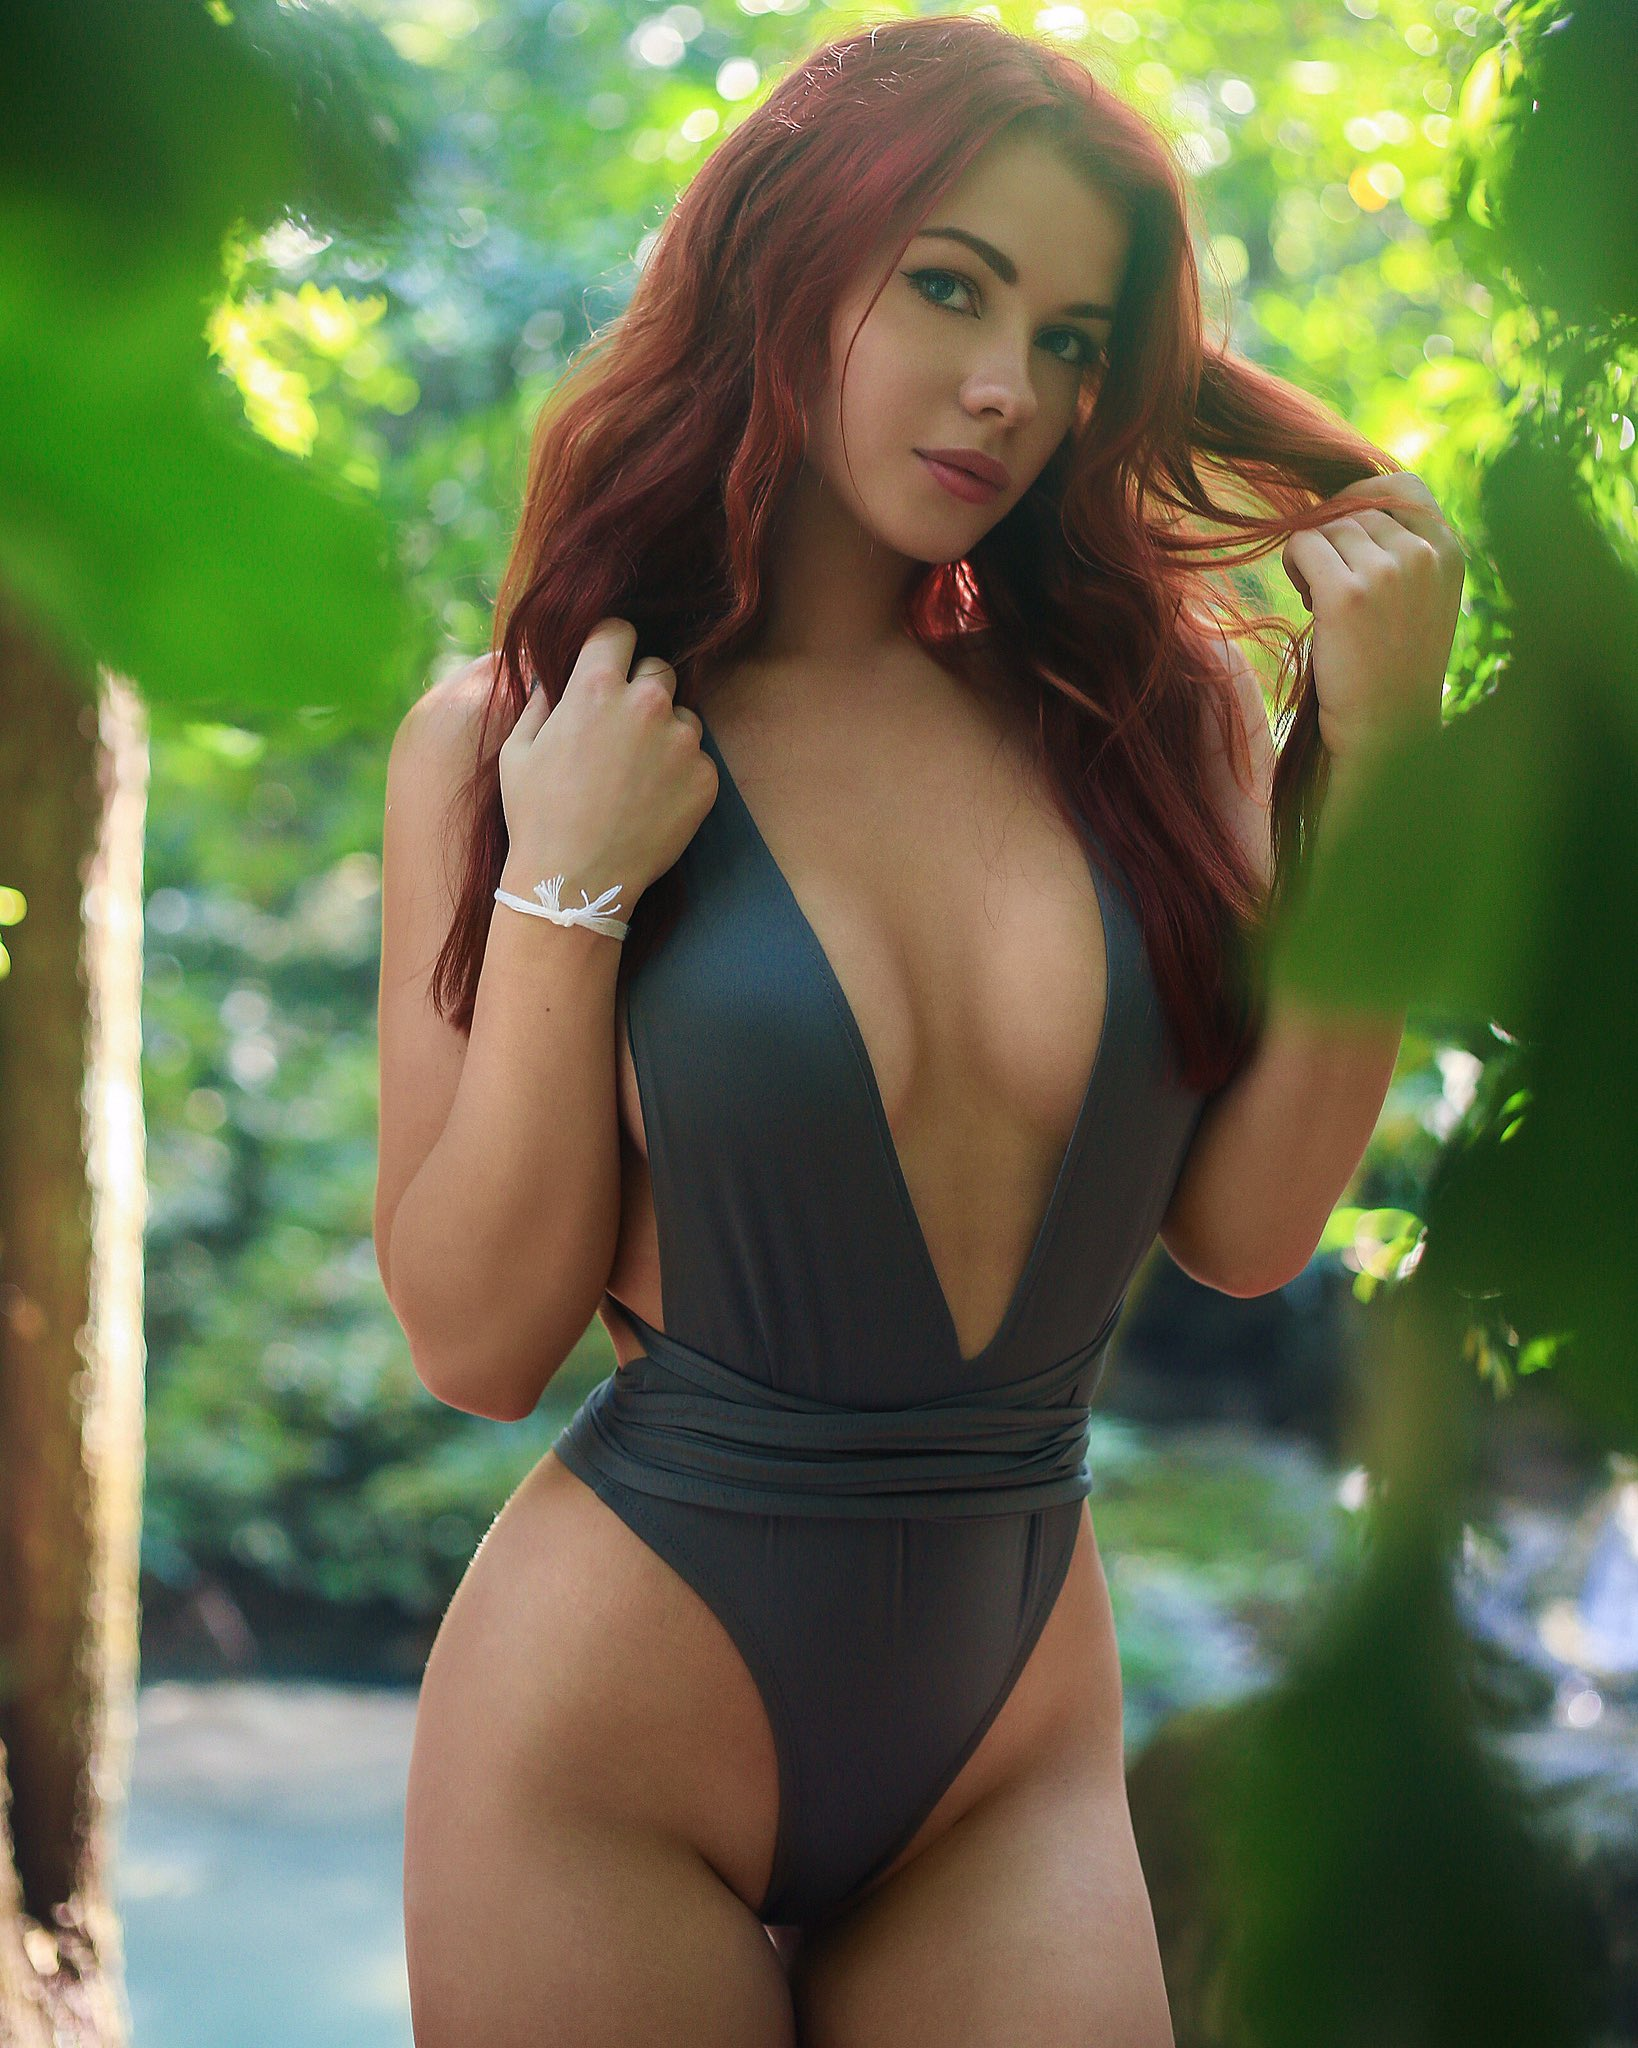 Irina Meier nudeAmerican Vietnamese singer Thanh Ha poses nude